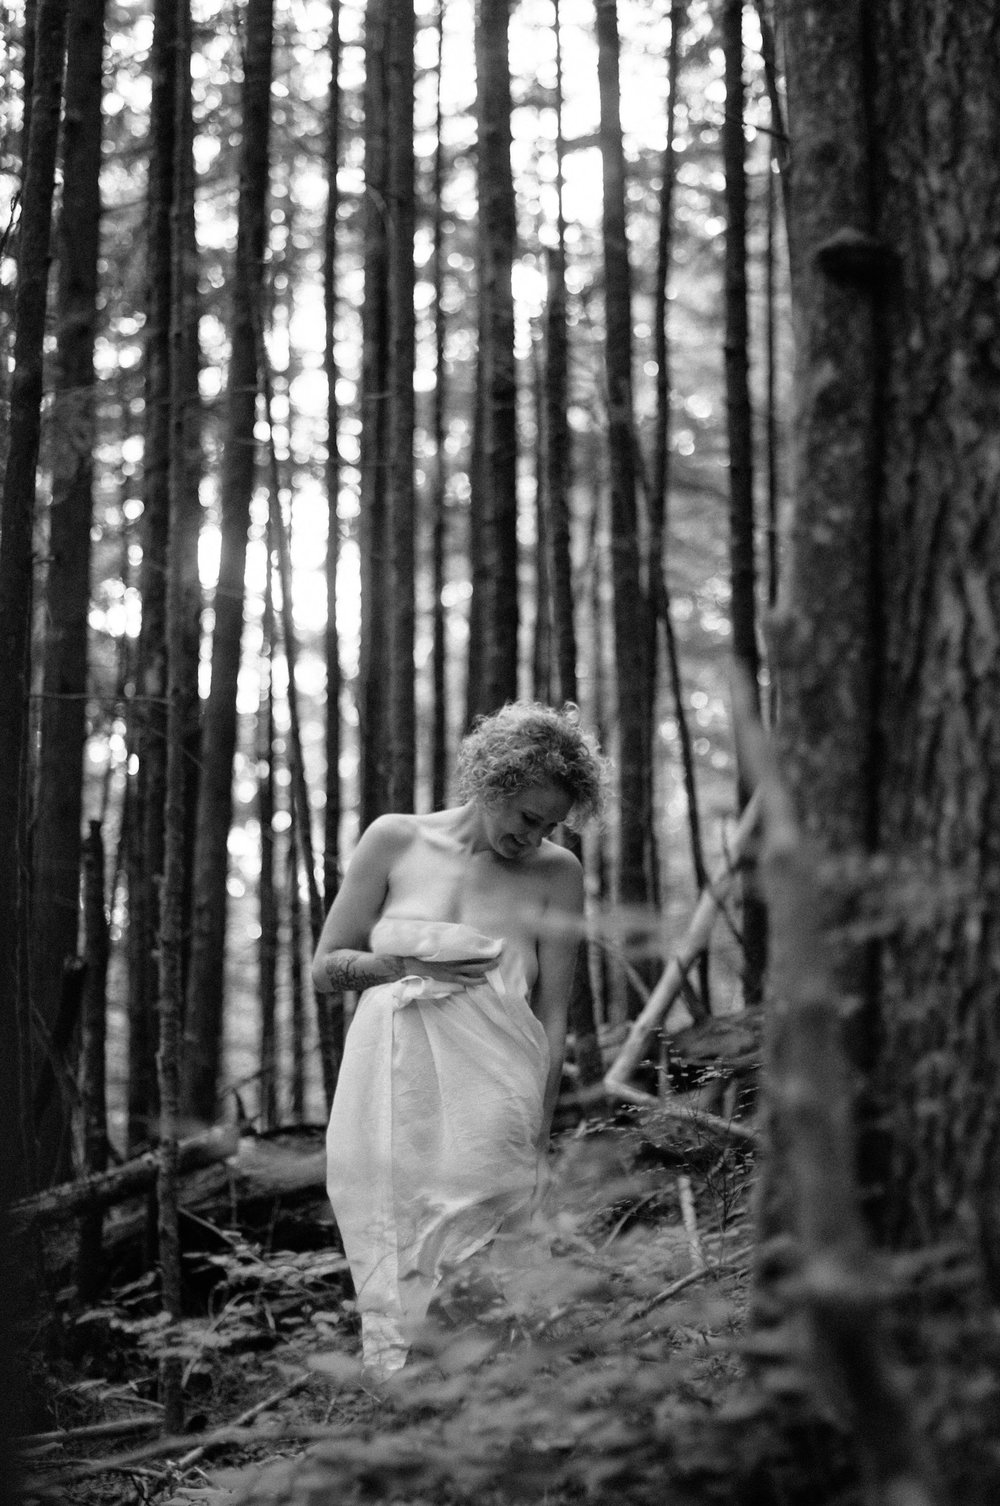 Boudoir Collective Fine Art Boudoir Blog and Magazine The Loud Camera Outdoor Forest Boudoir 8.jpg